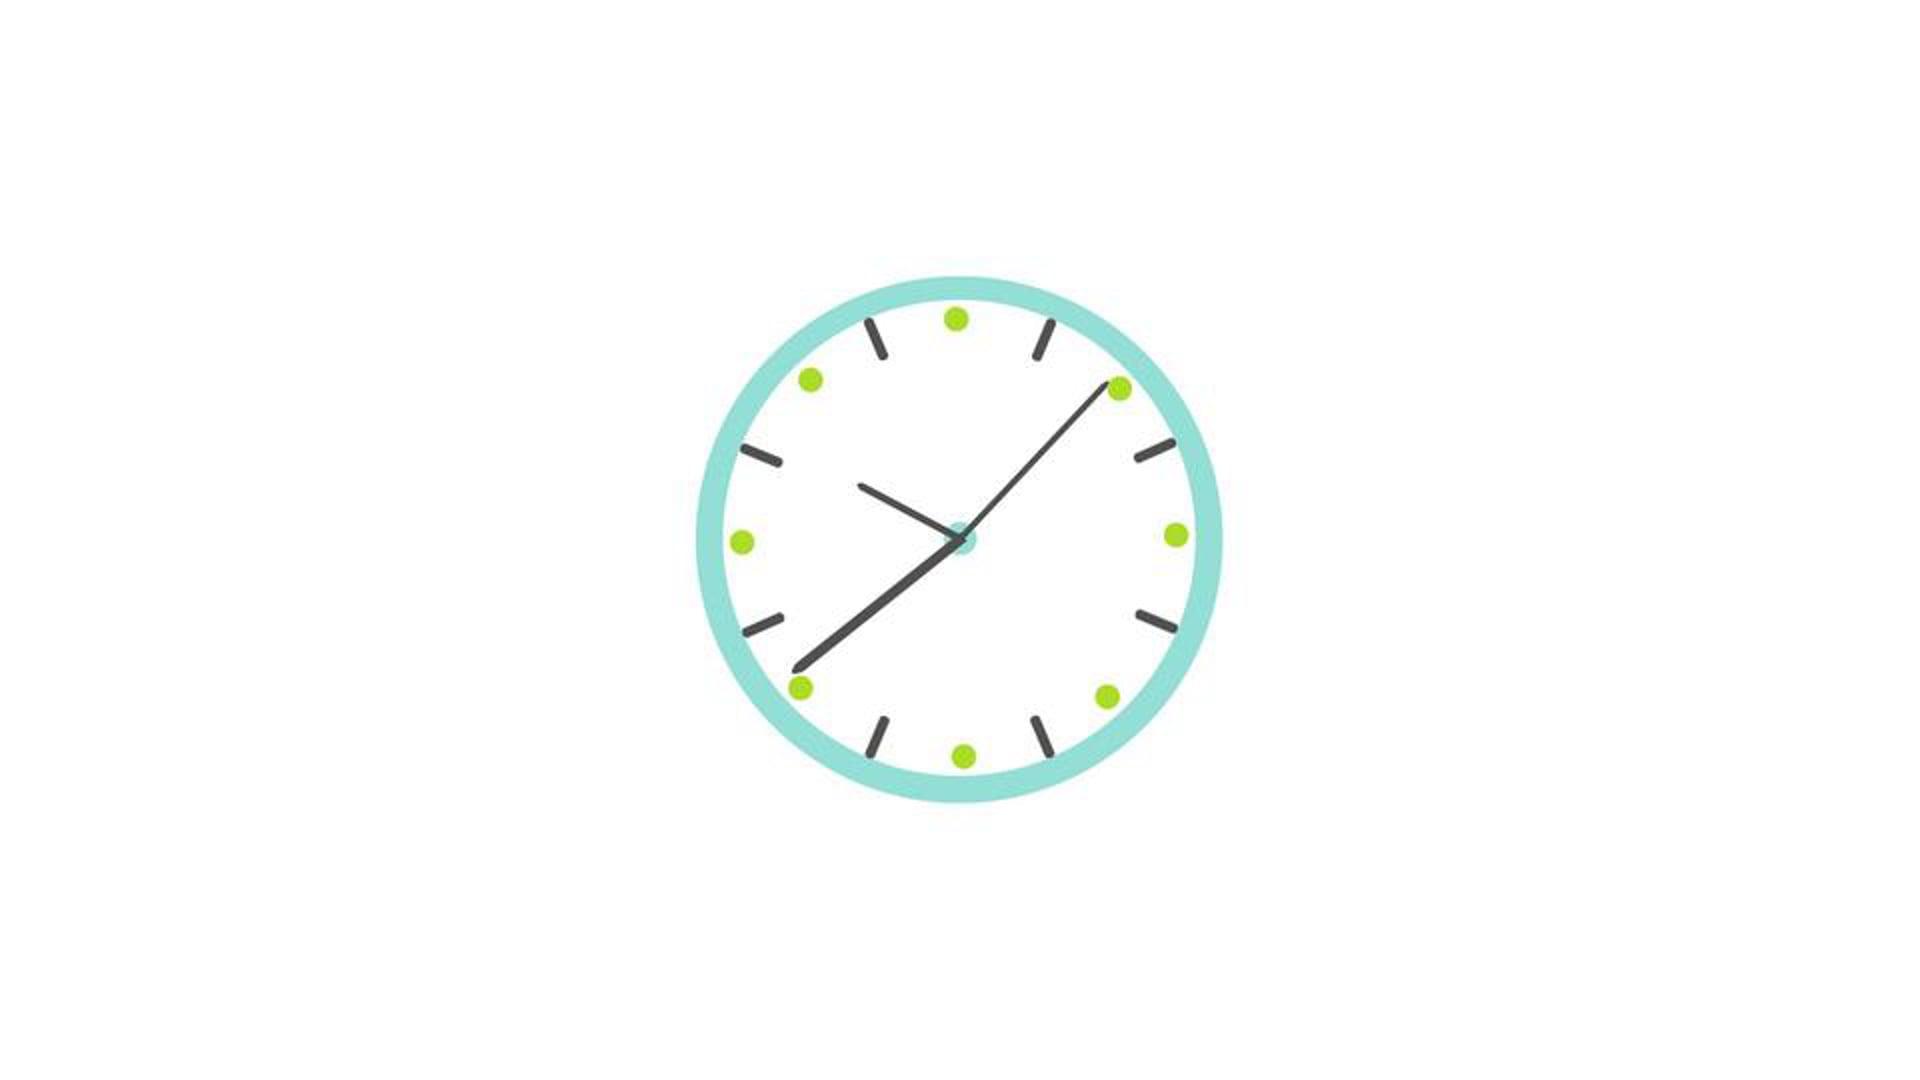 HQ Marketing Minute animation